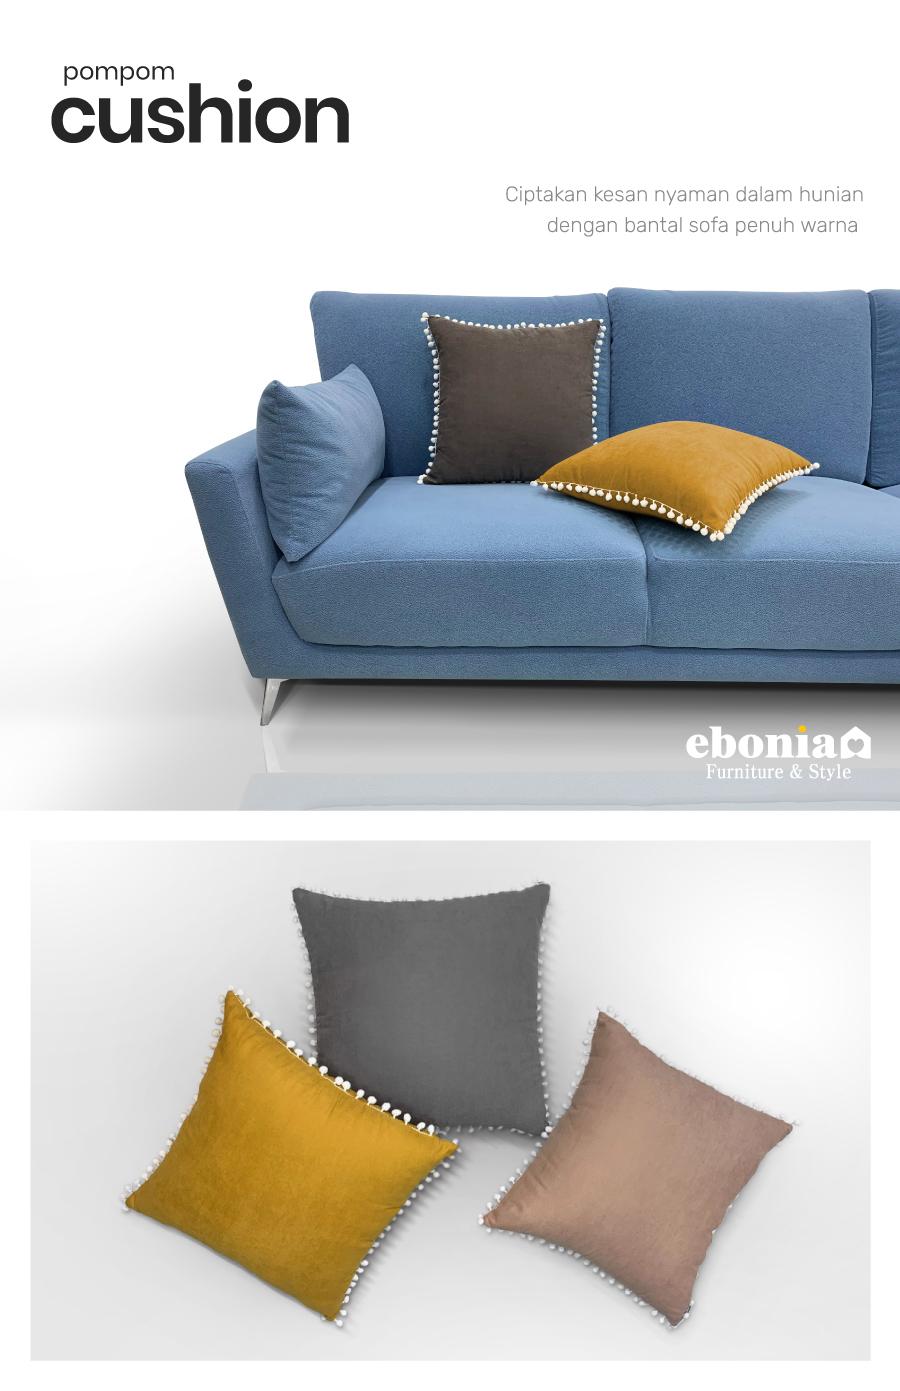 pompom_cushion_intro.jpg